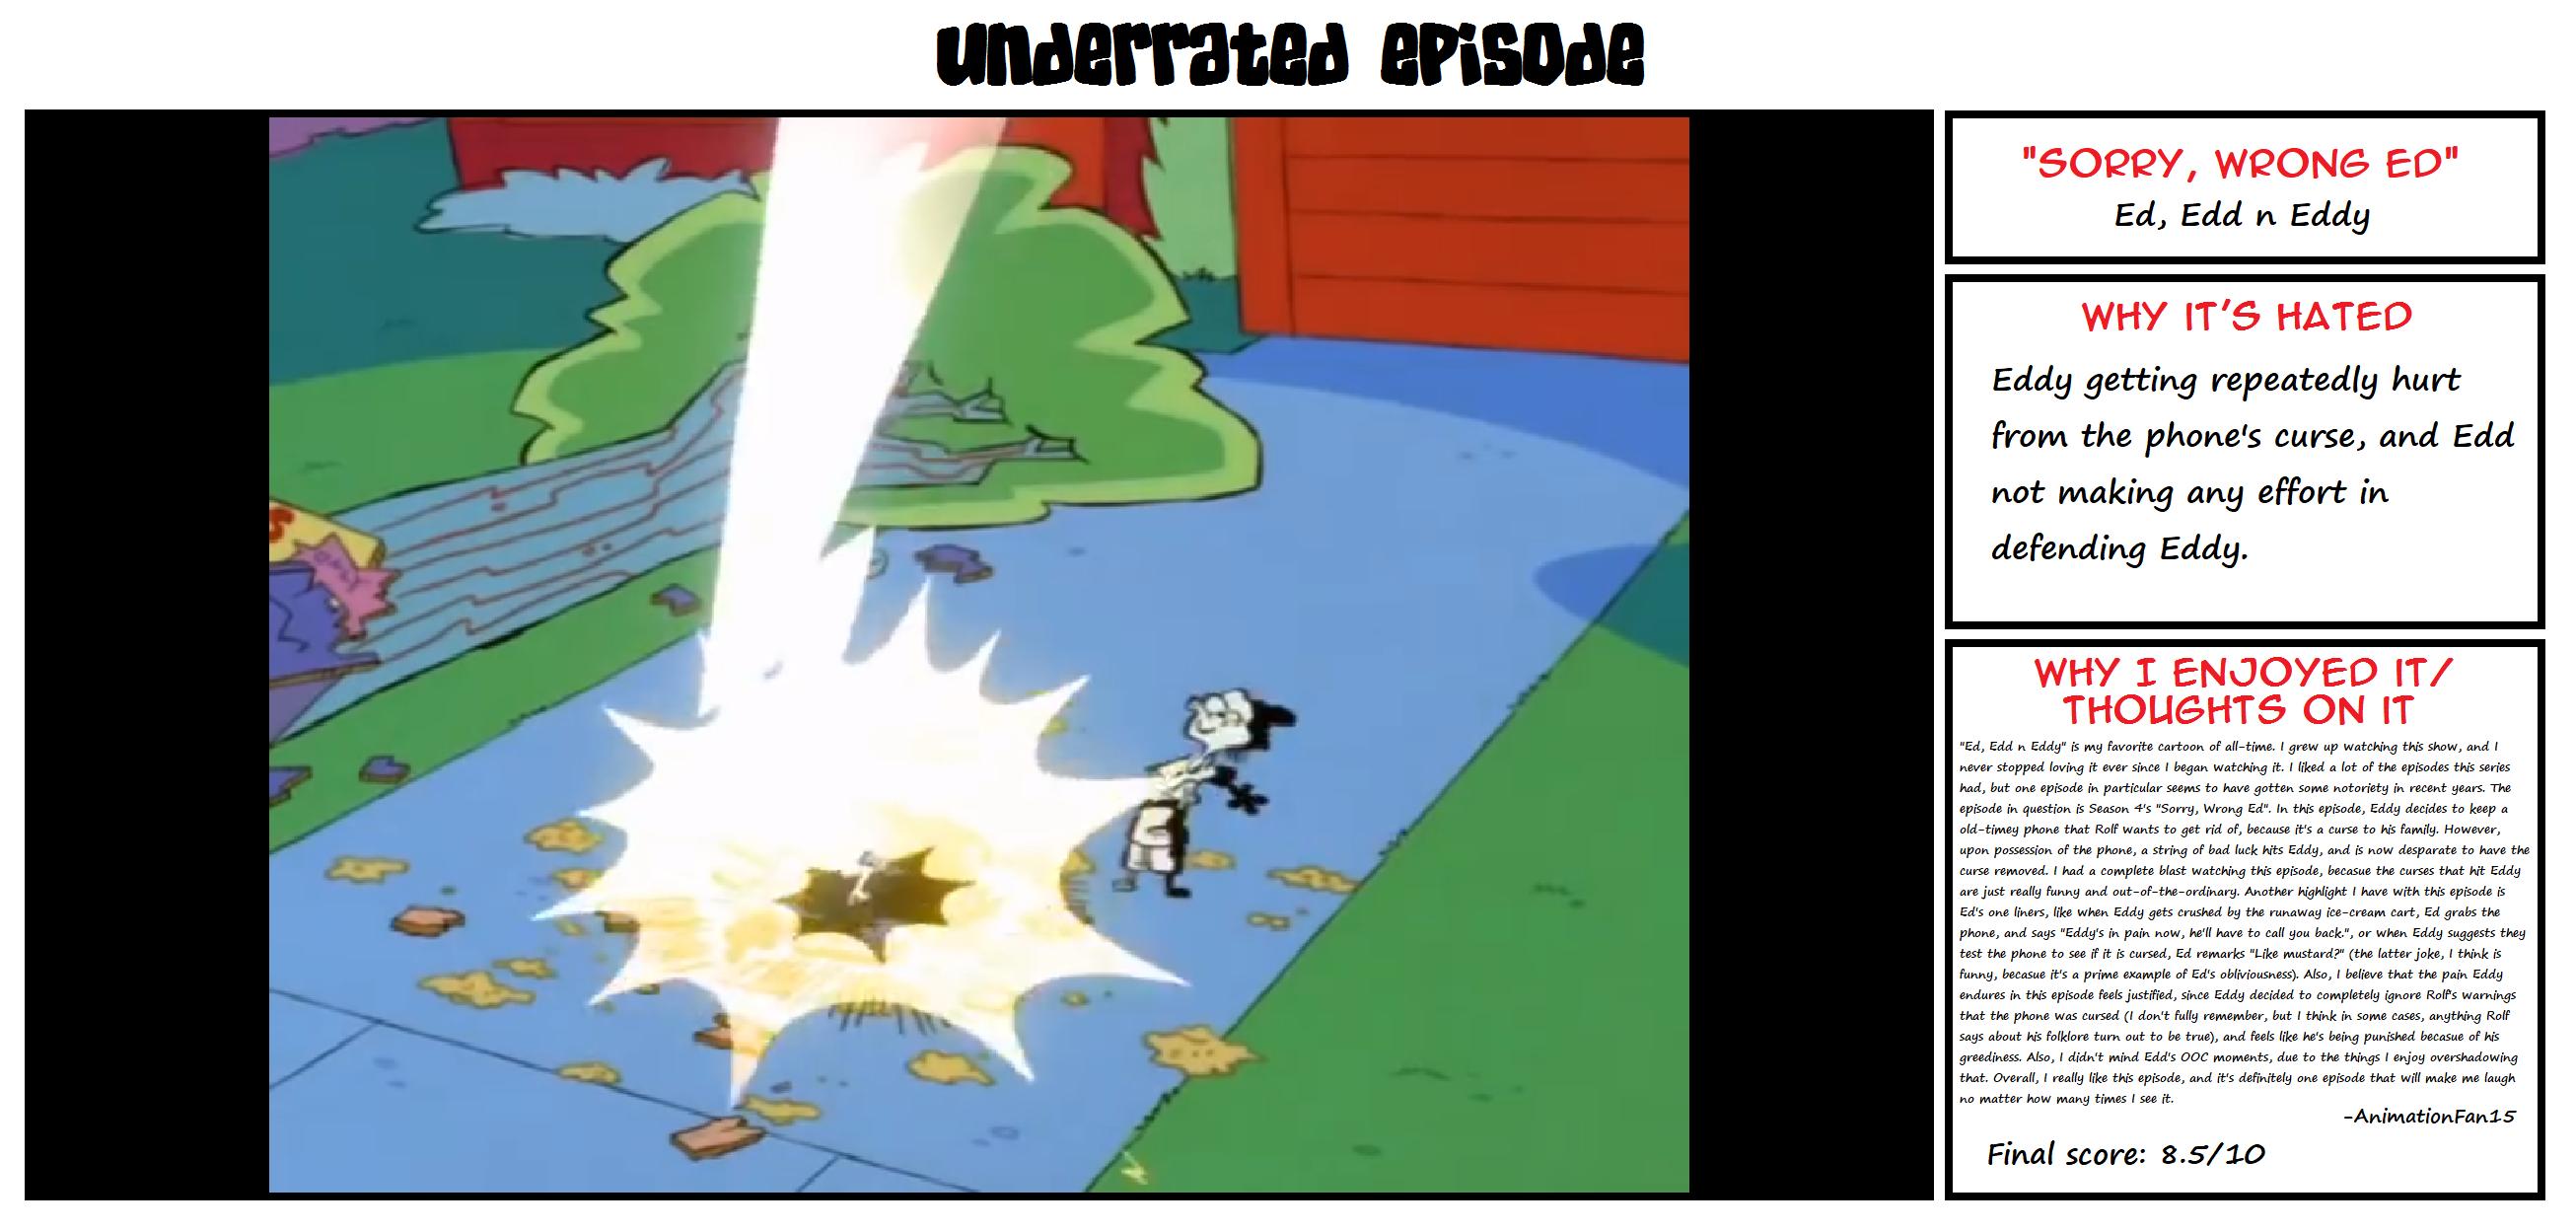 animationfan15 isaac vargas deviantart